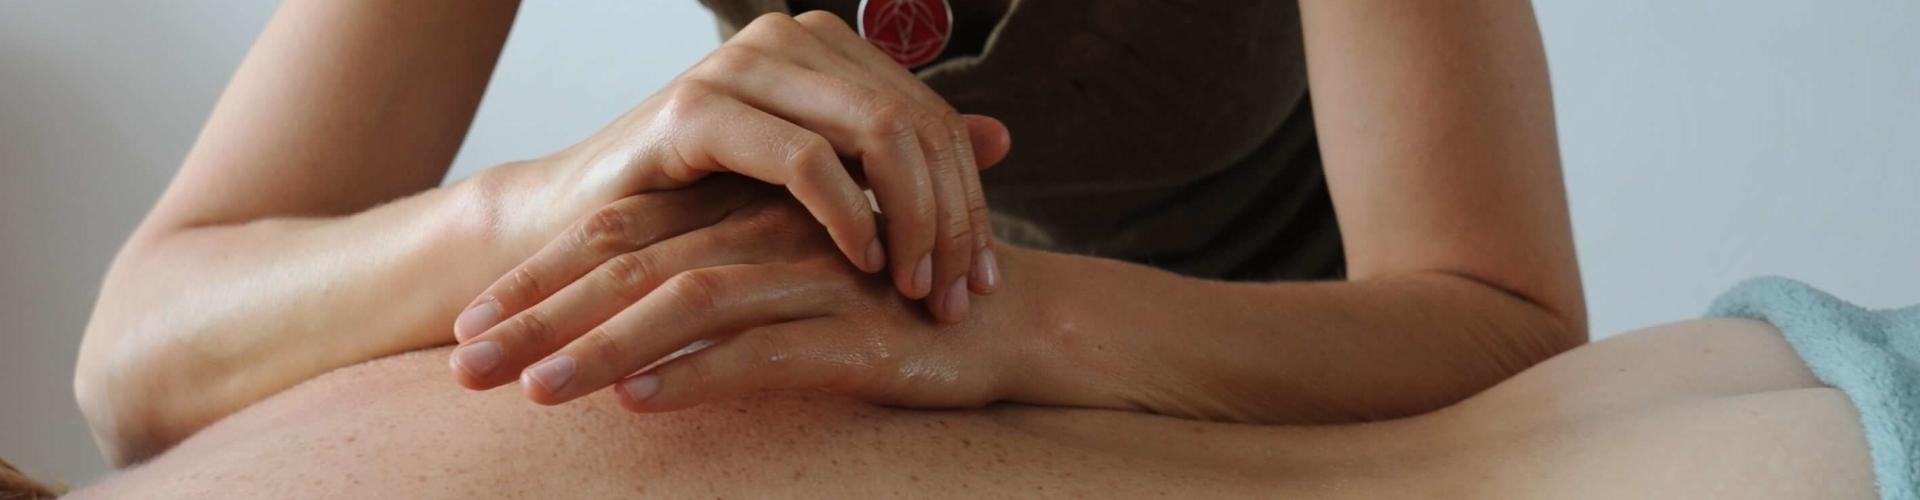 ontspanningsmassage-nijmegen-lent